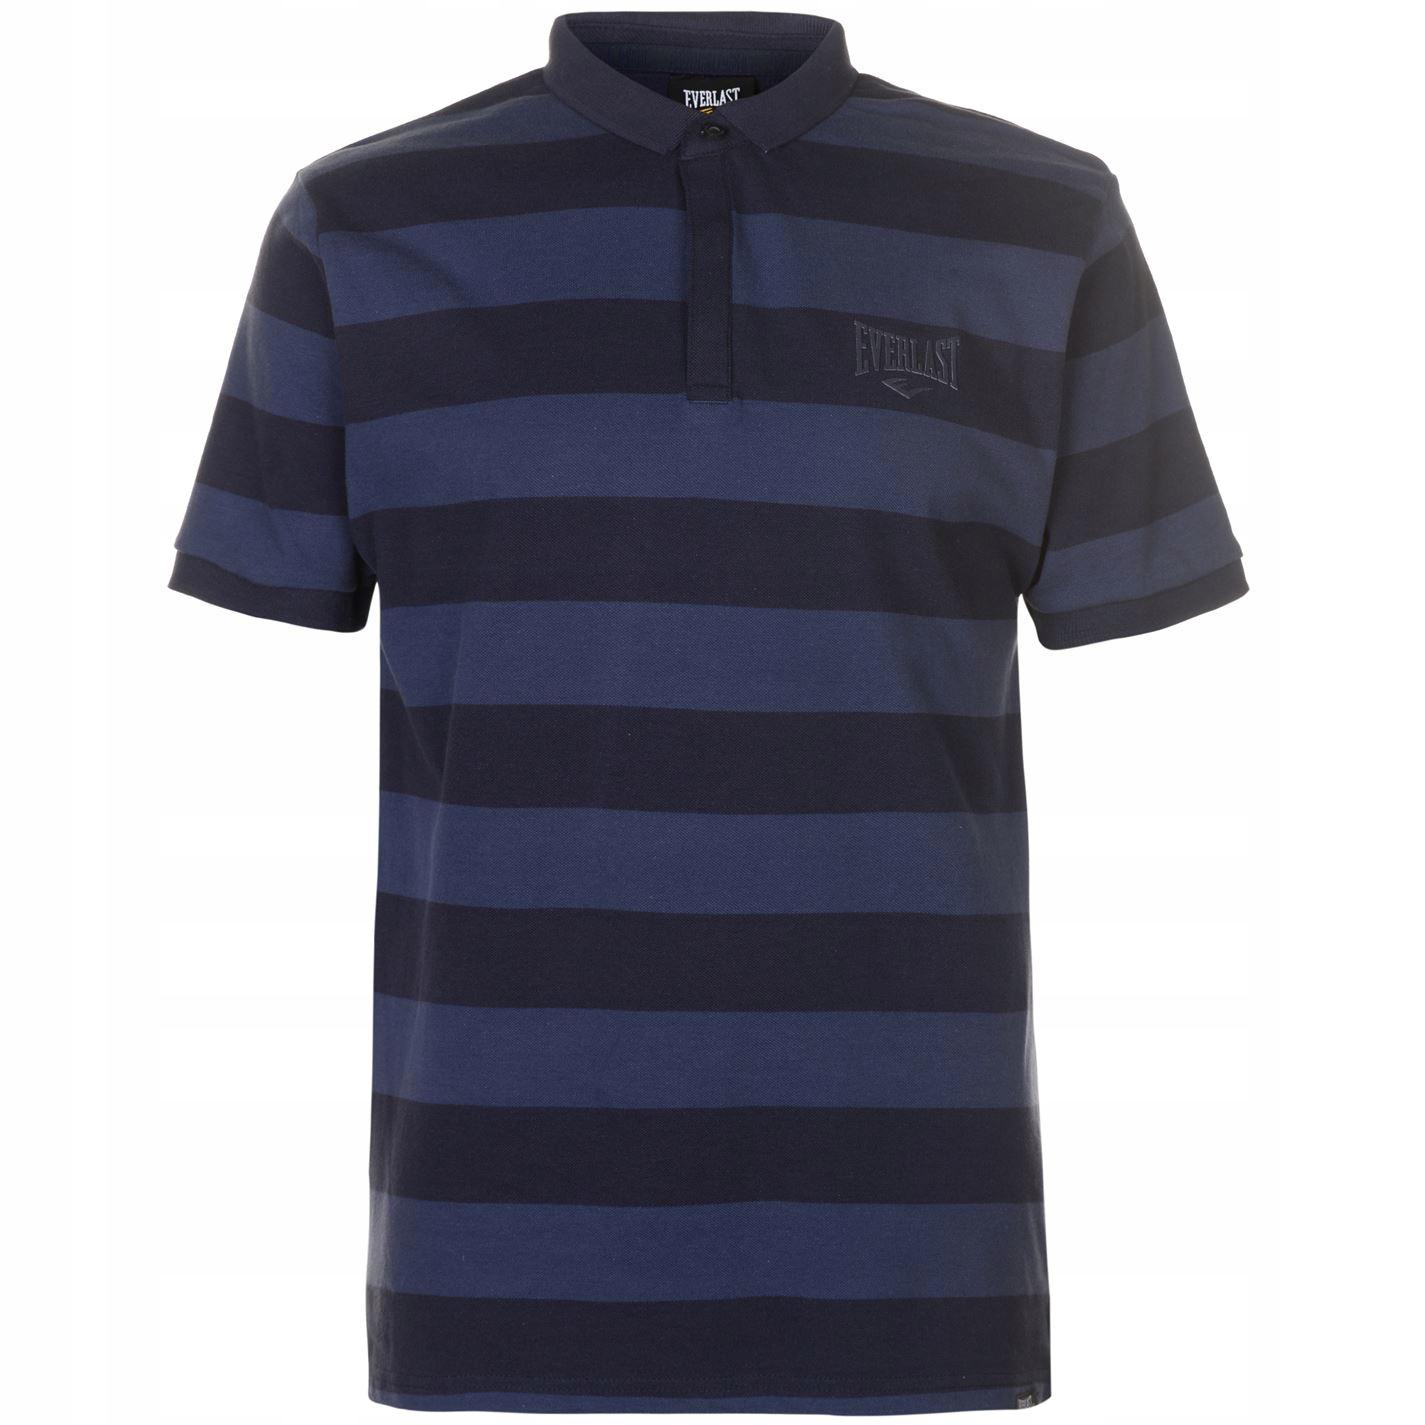 Koszulka POLO EVERLAST męska 100% bawełna Granat M